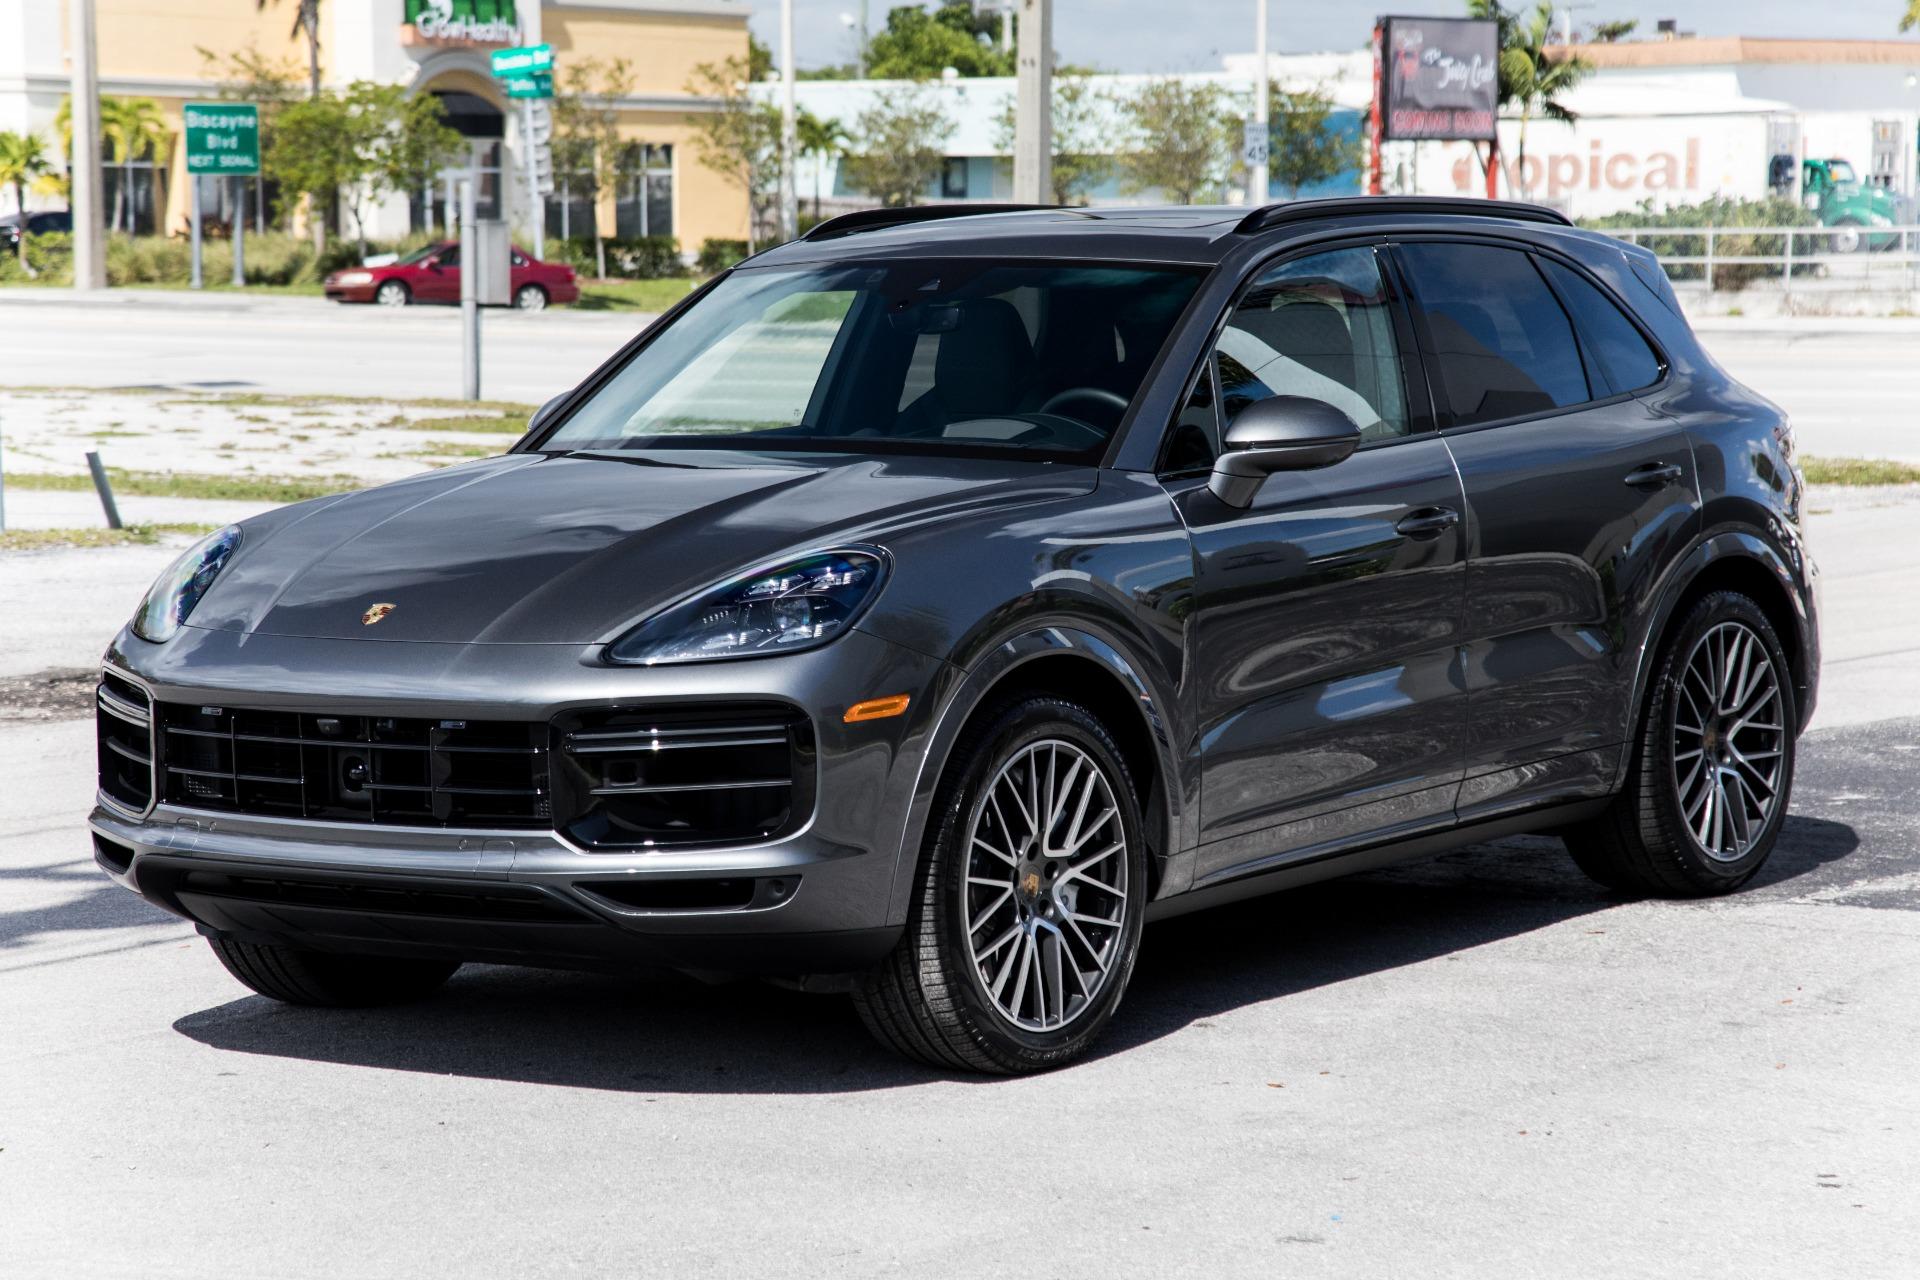 Used-2019-Porsche-Cayenne-Turbo